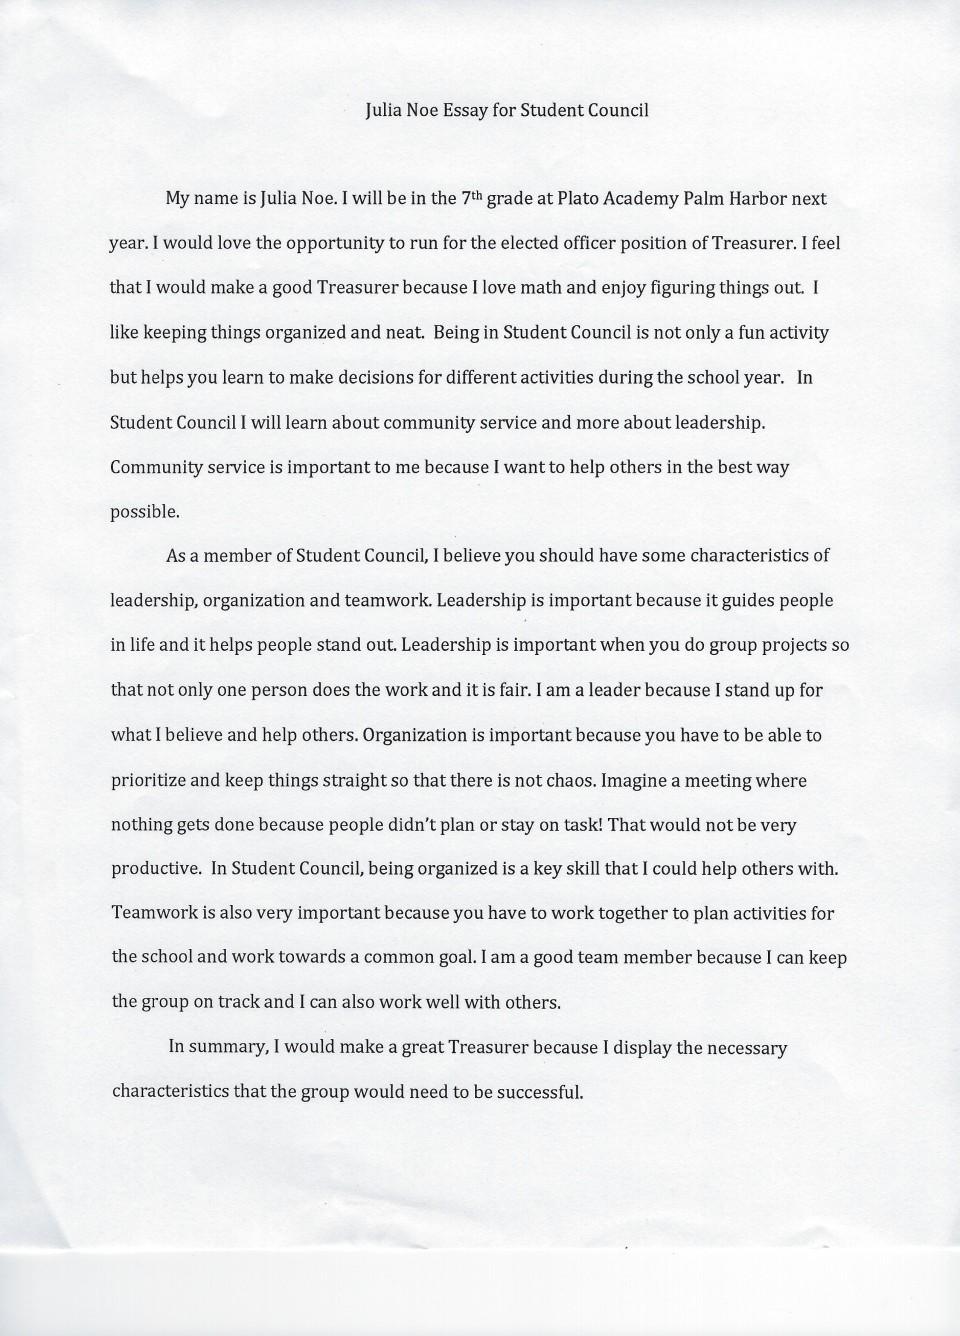 009 Student Council Essay Example Treasurer Noe Phenomenal Rubric Conclusion 960